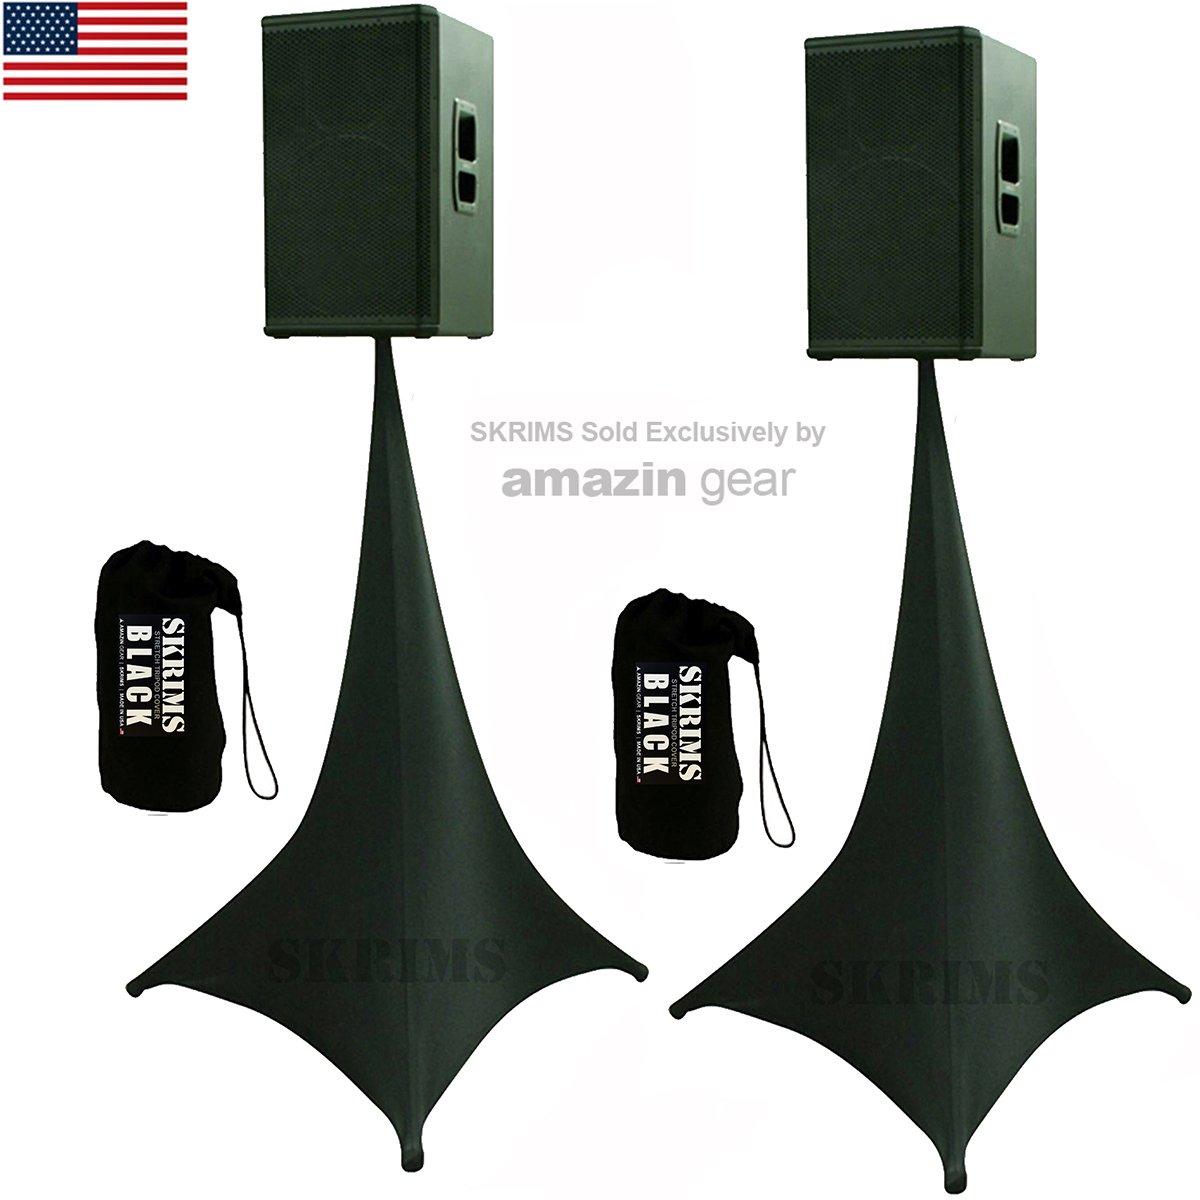 2-Pack Amazin Gear SKRIMS Tripod Speaker Stand Stretch Covers - Triple Sided DJ Scrims - Spandex DJ Skirts 3-Sides - Scrims 360 +2 FREE Travel Bags - BLACK PAIR (SKRIMS-3B-2)